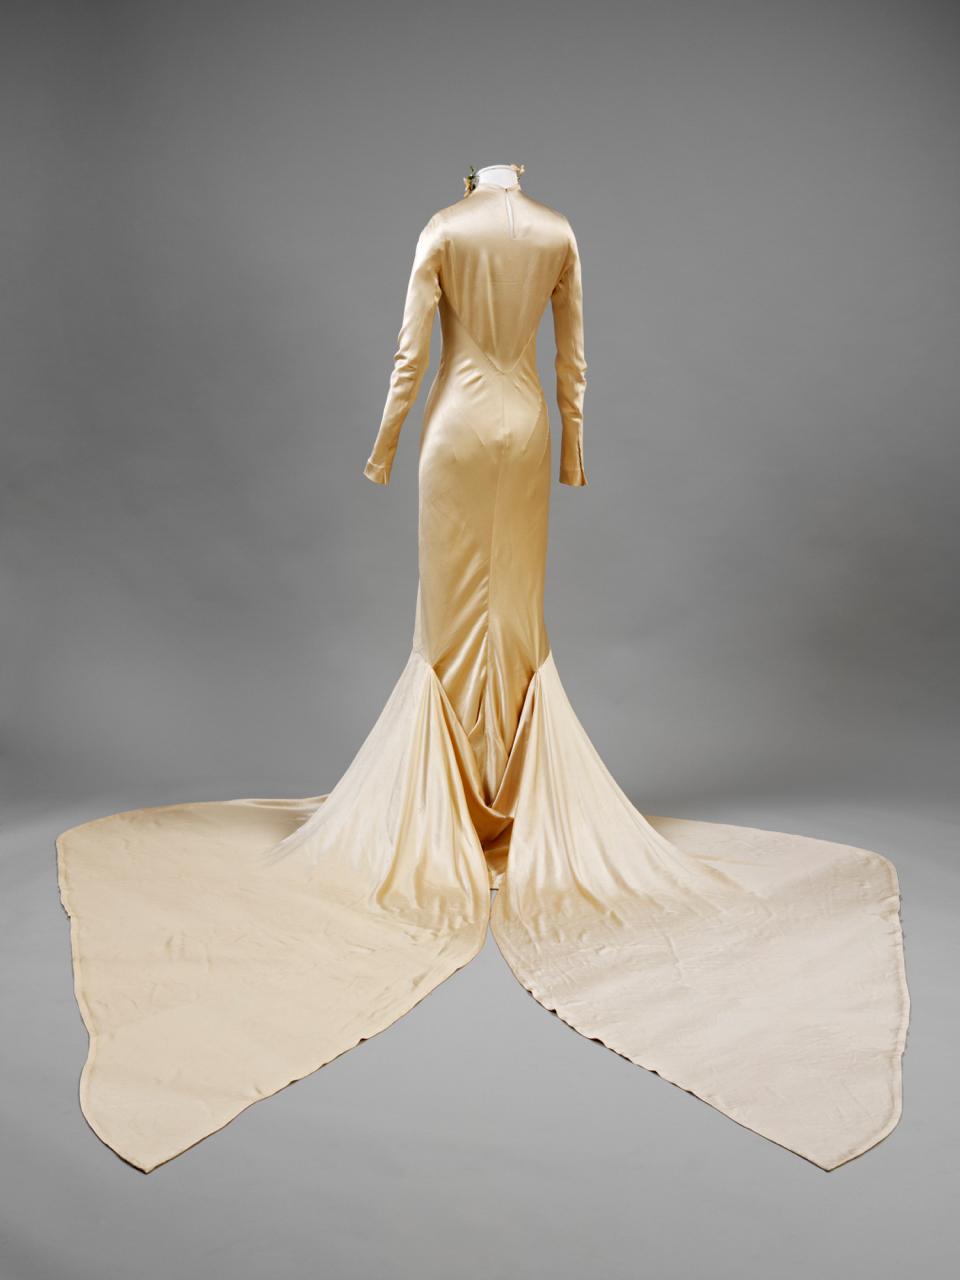 The V&A Wedding Dress Exhibition: 1775 – 2014